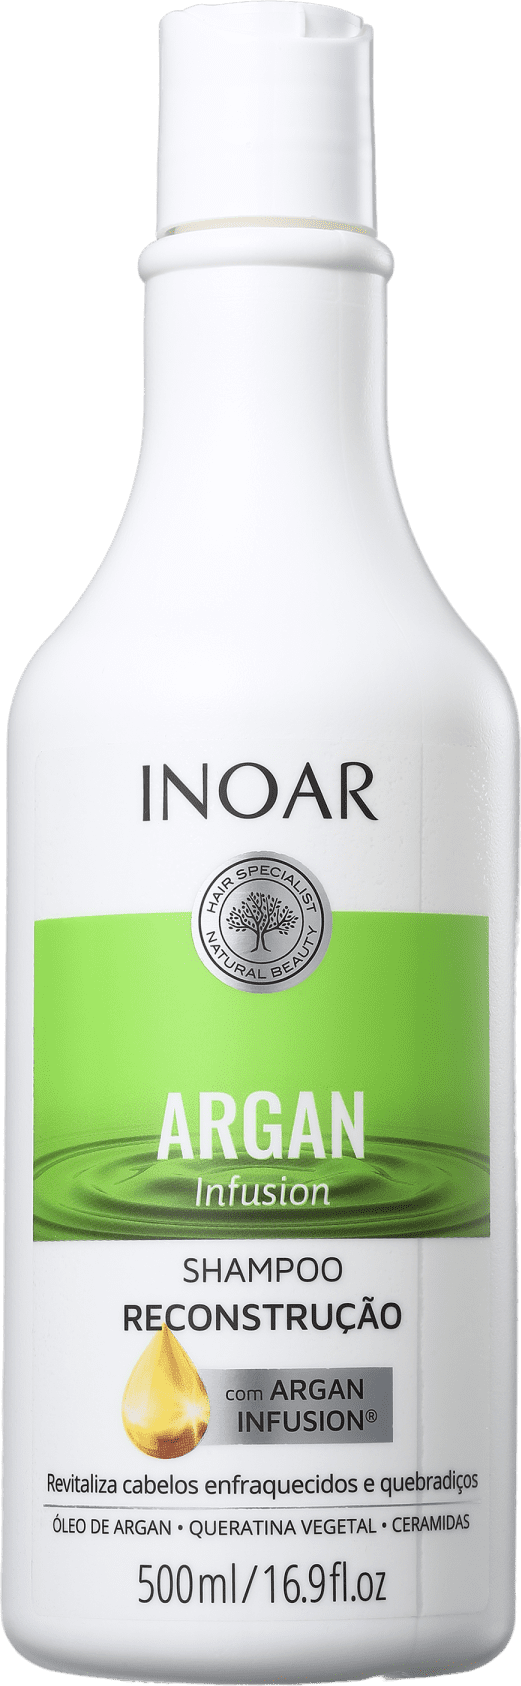 Shampoo Argan Infusion Reconstrução 500ml - Inoar